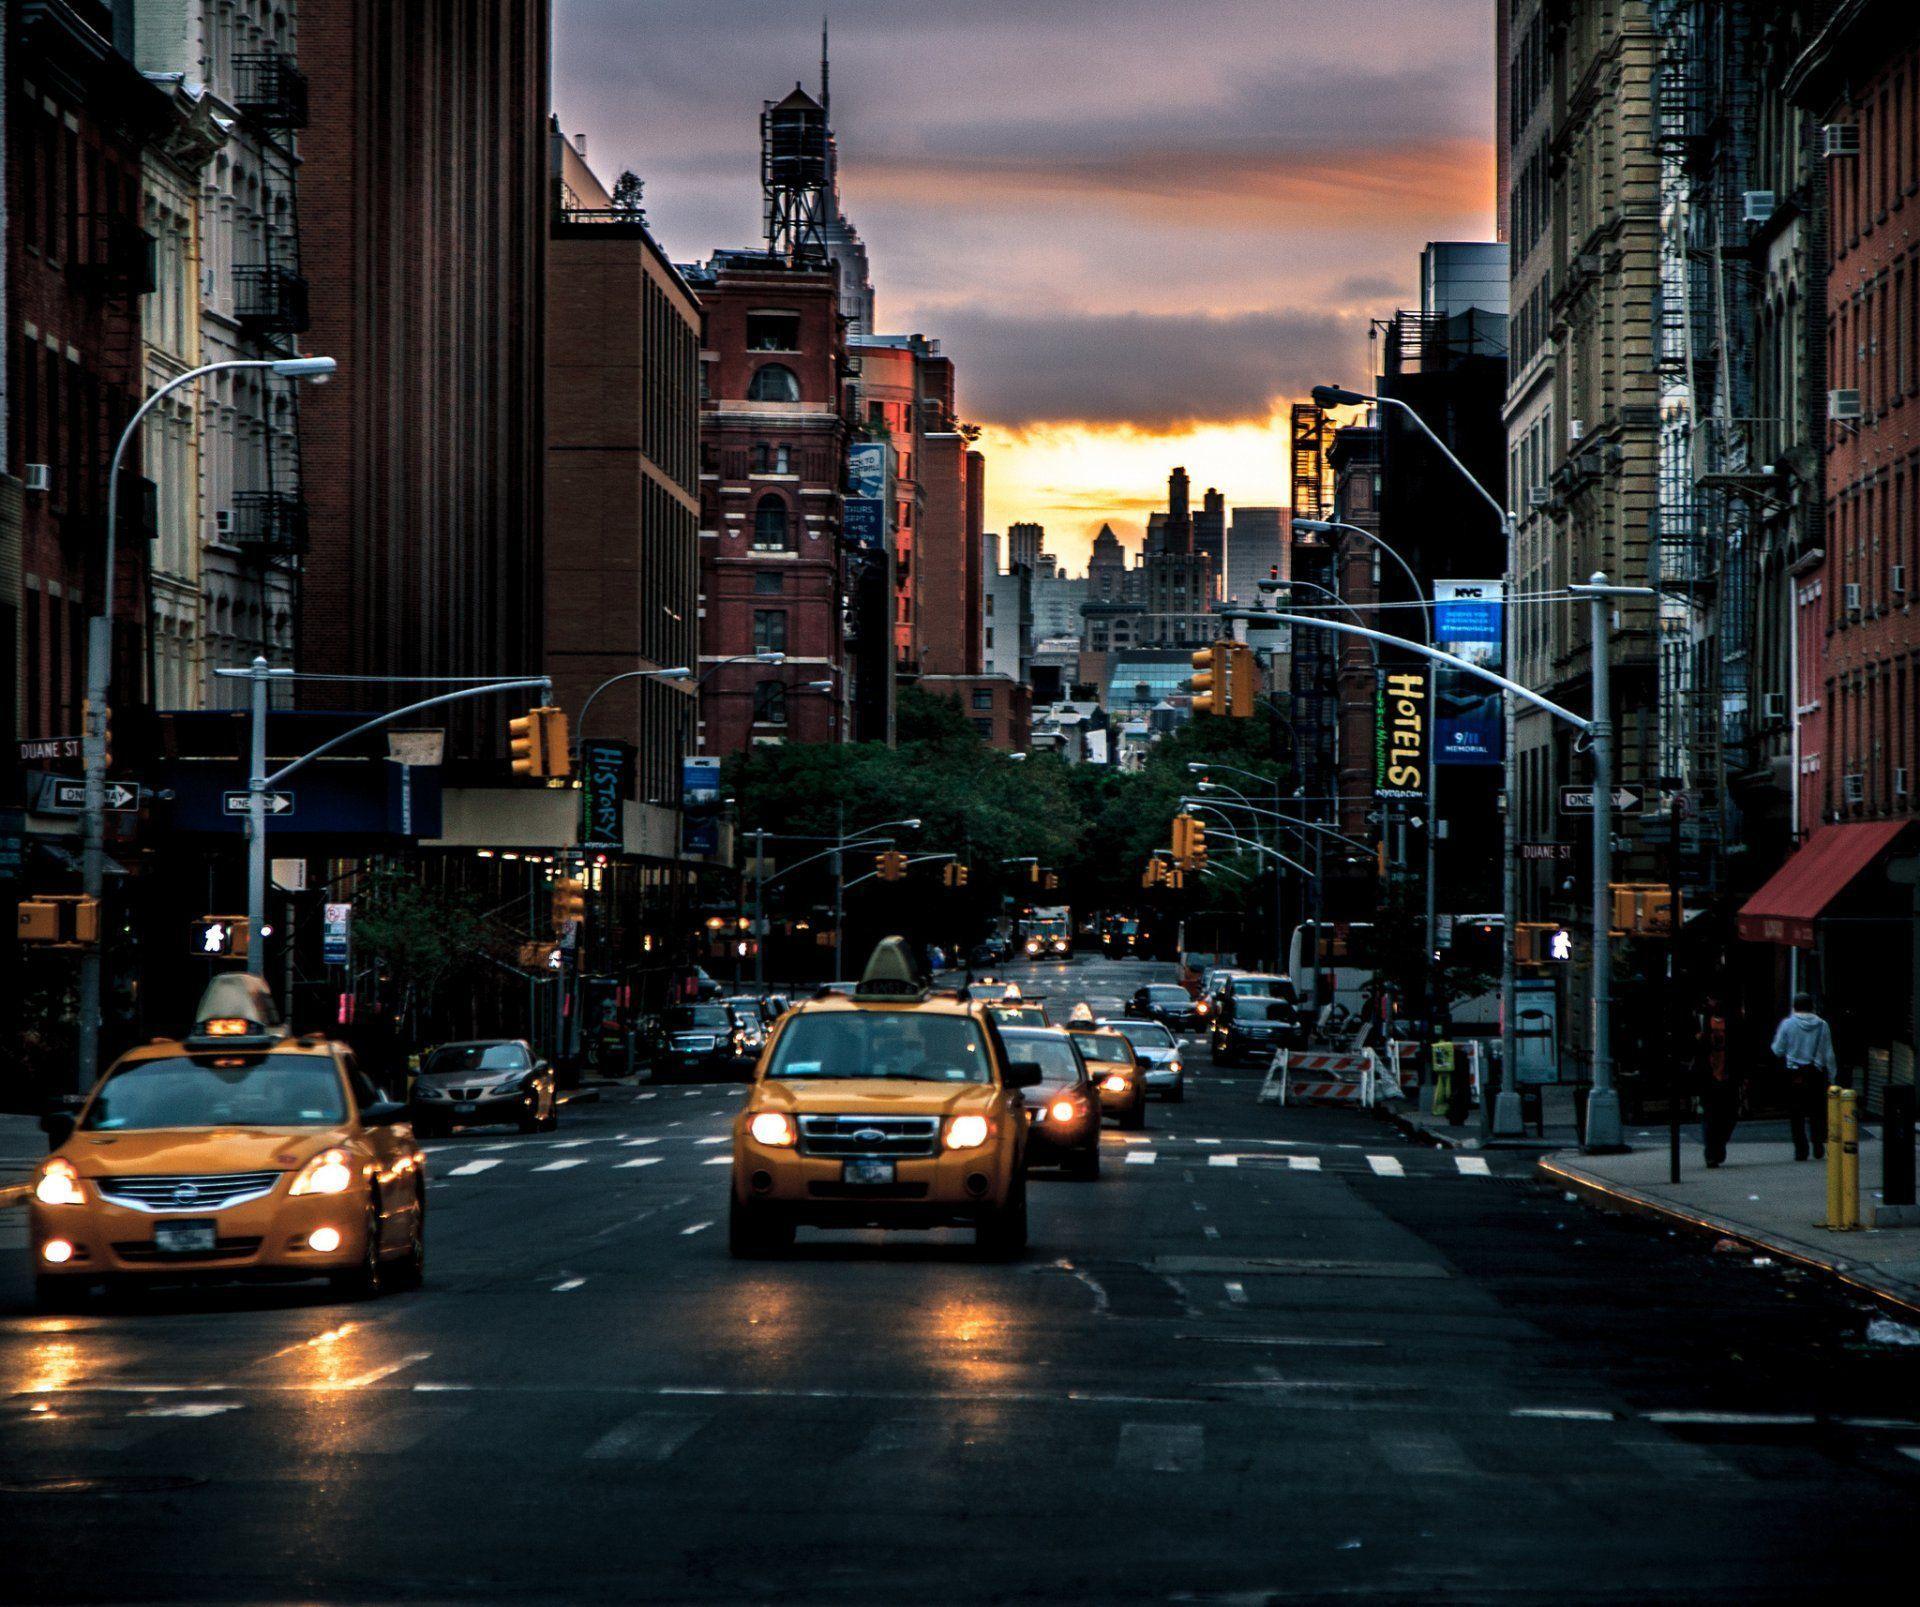 New York Street Wallpapers